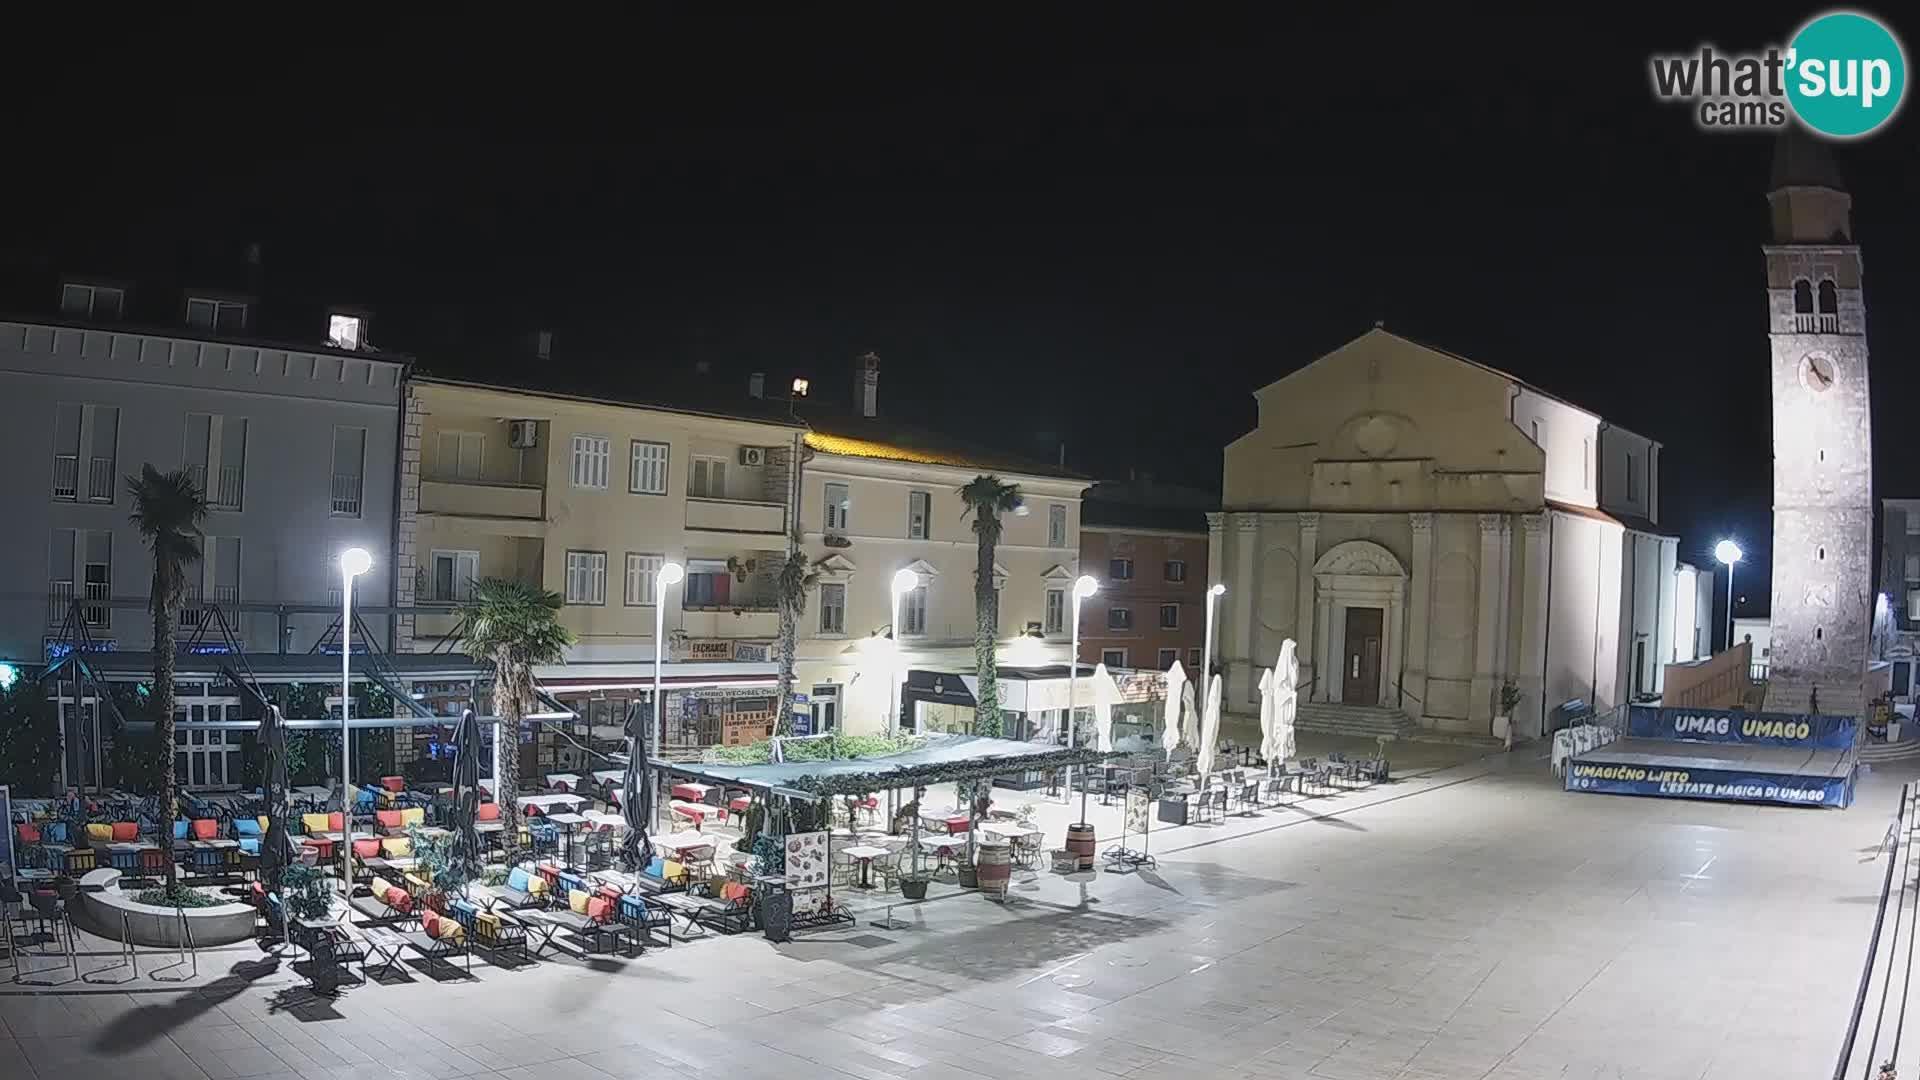 Webcam – Piazza centrale di Umago